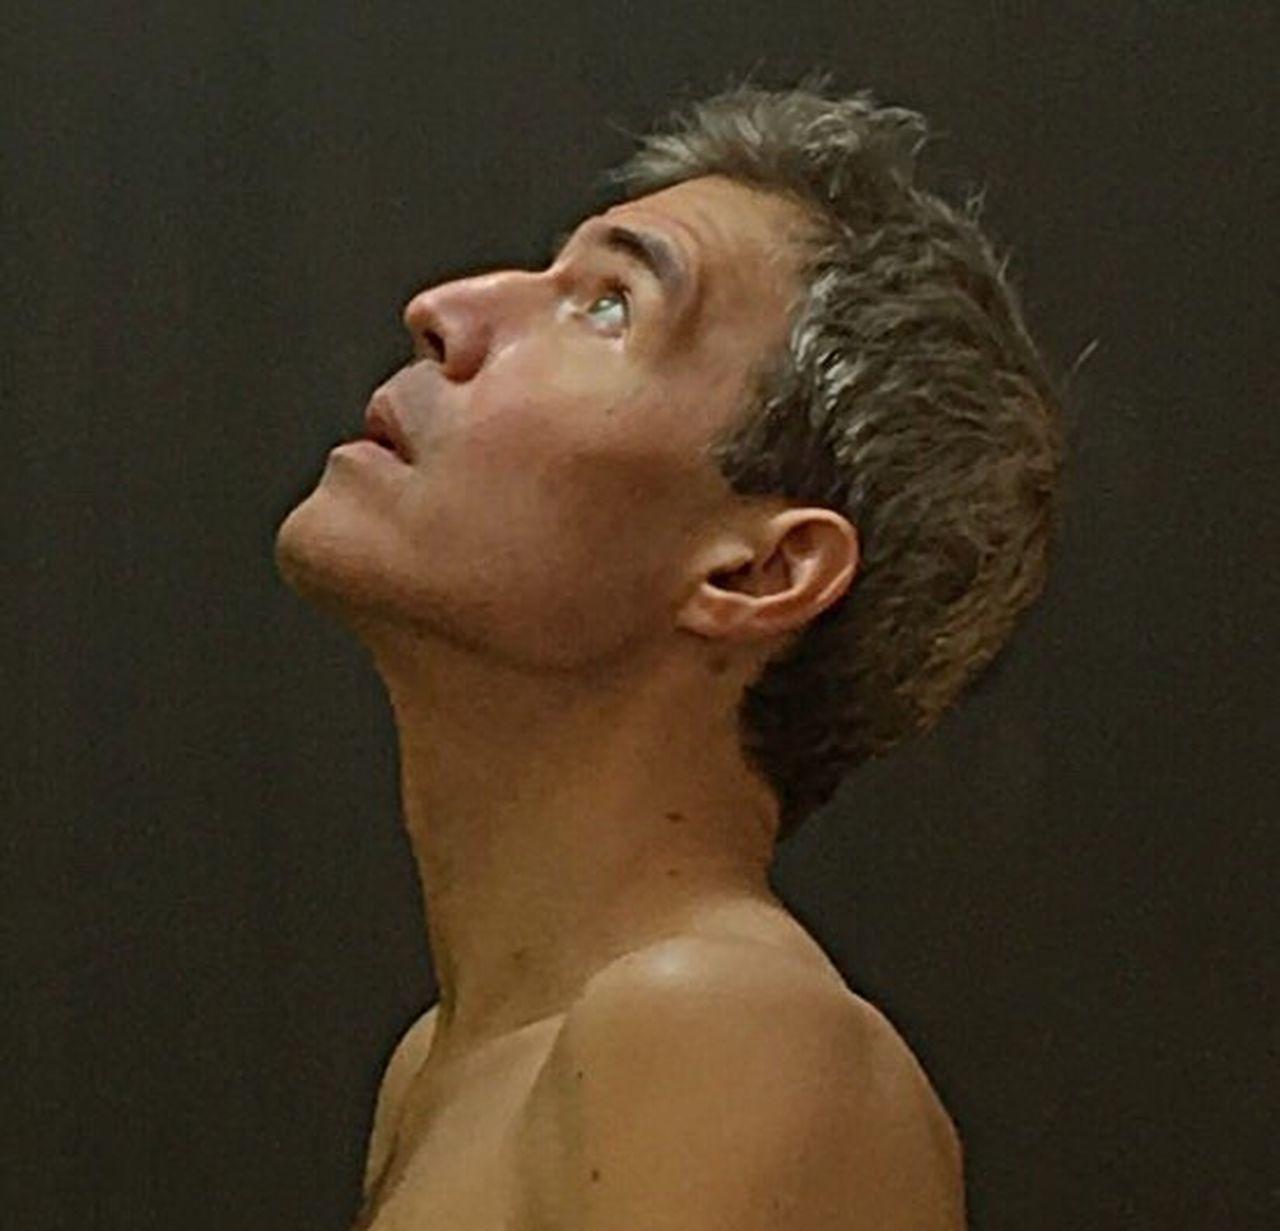 Studio Photography Self Portrait Studio Shot Beam Me Up Studiolighting